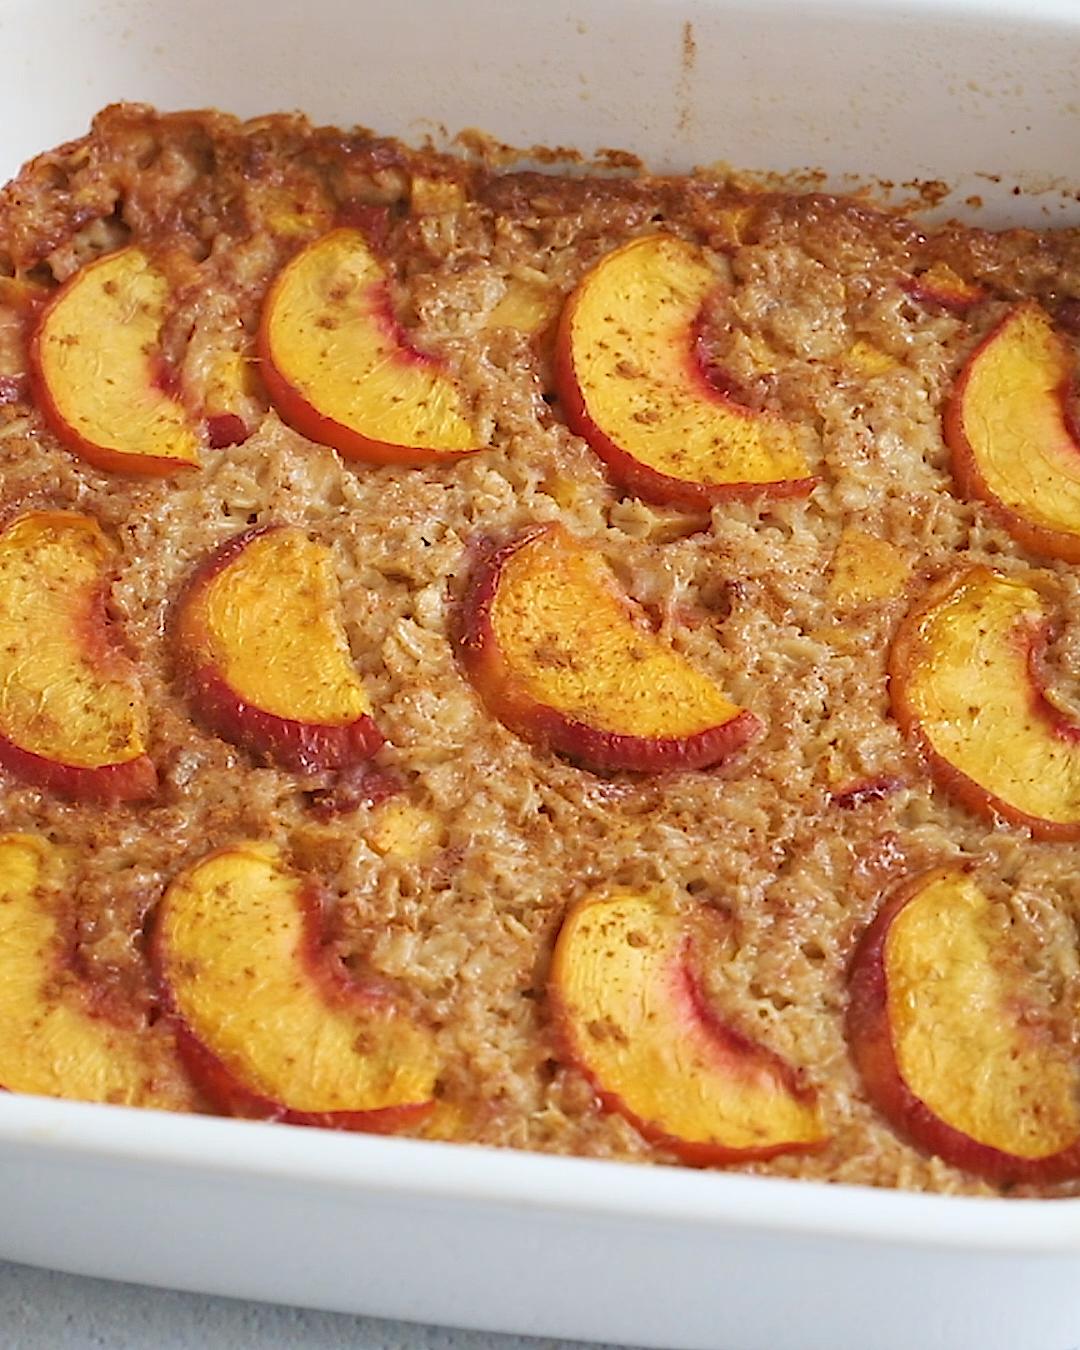 Peach Baked Oatmeal #healthybreakfast